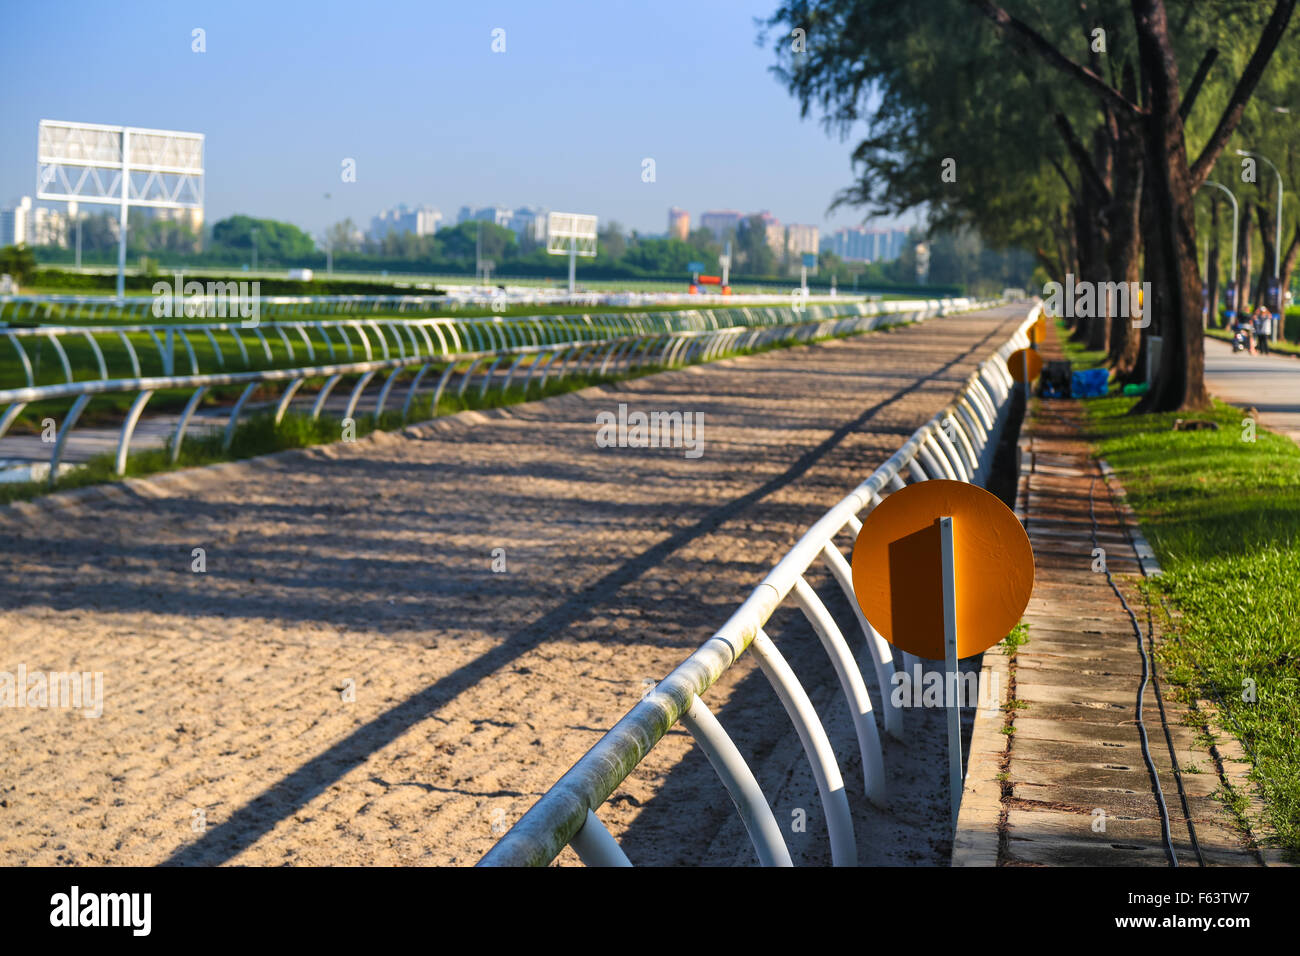 Straight horse race track at Selangor Turf Club, Seri Kembangan, Malaysia. - Stock Image